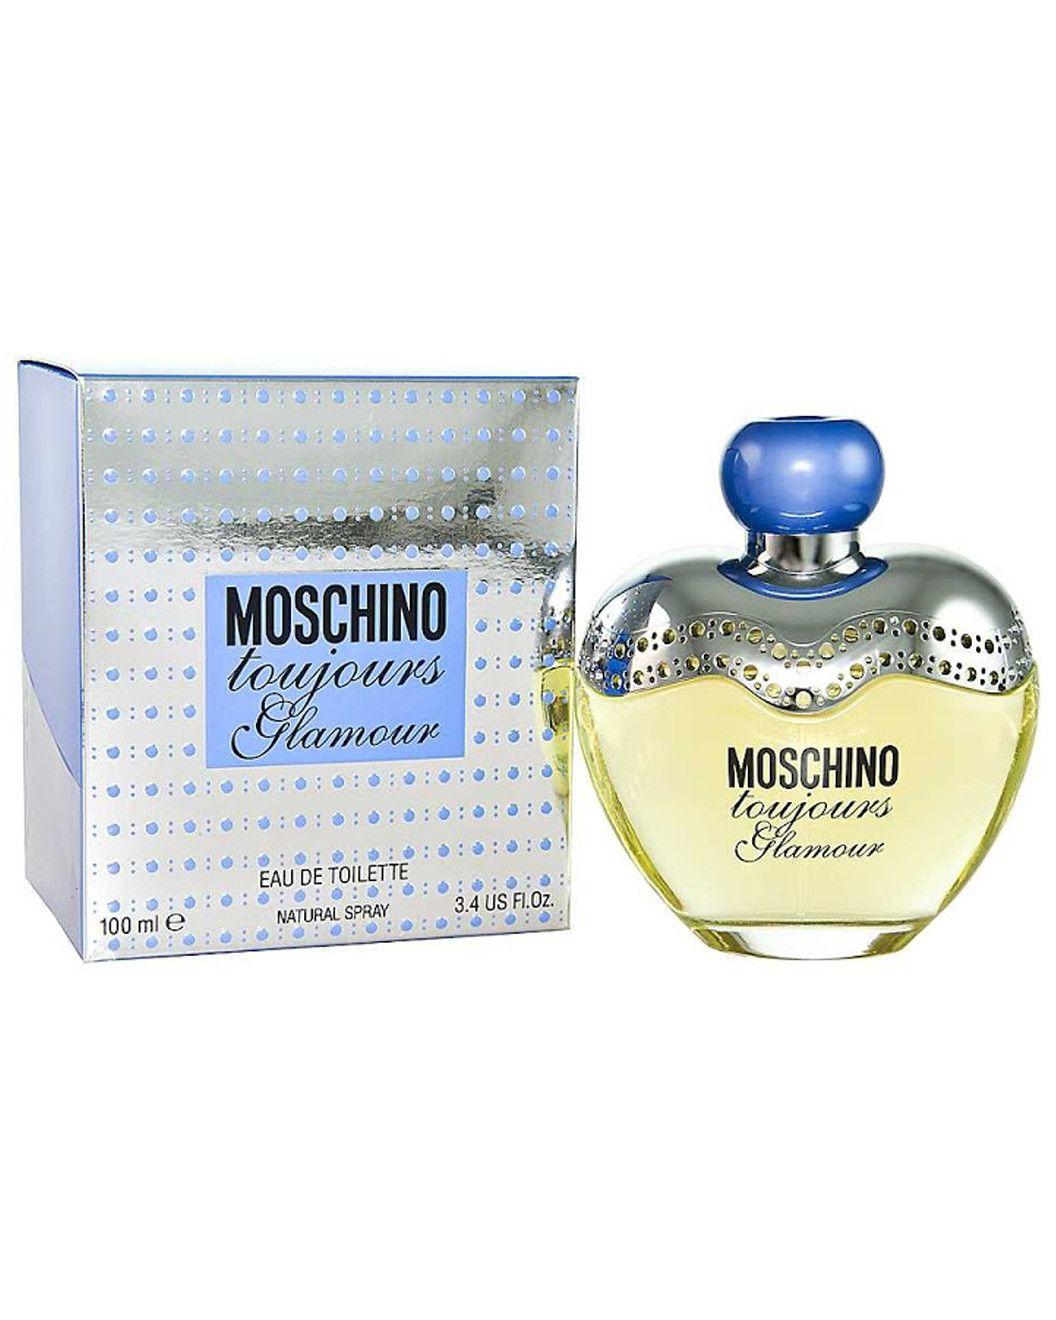 Spotted this Moschino Toujours Glamour 3.4oz Eau de Toilette Spray on Rue La La. Shop (quickly!).